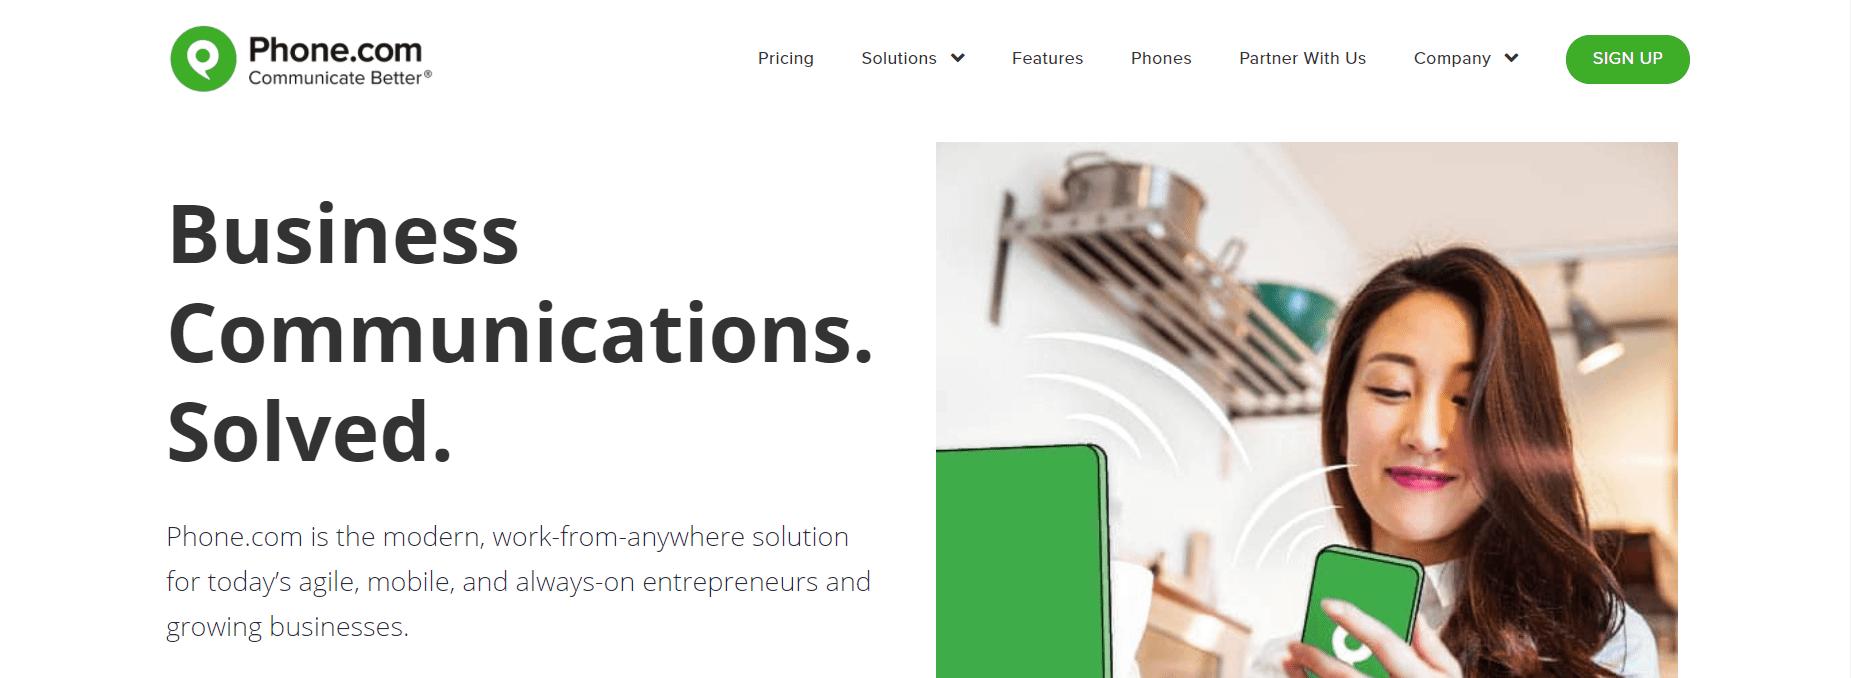 Phone.com主页。